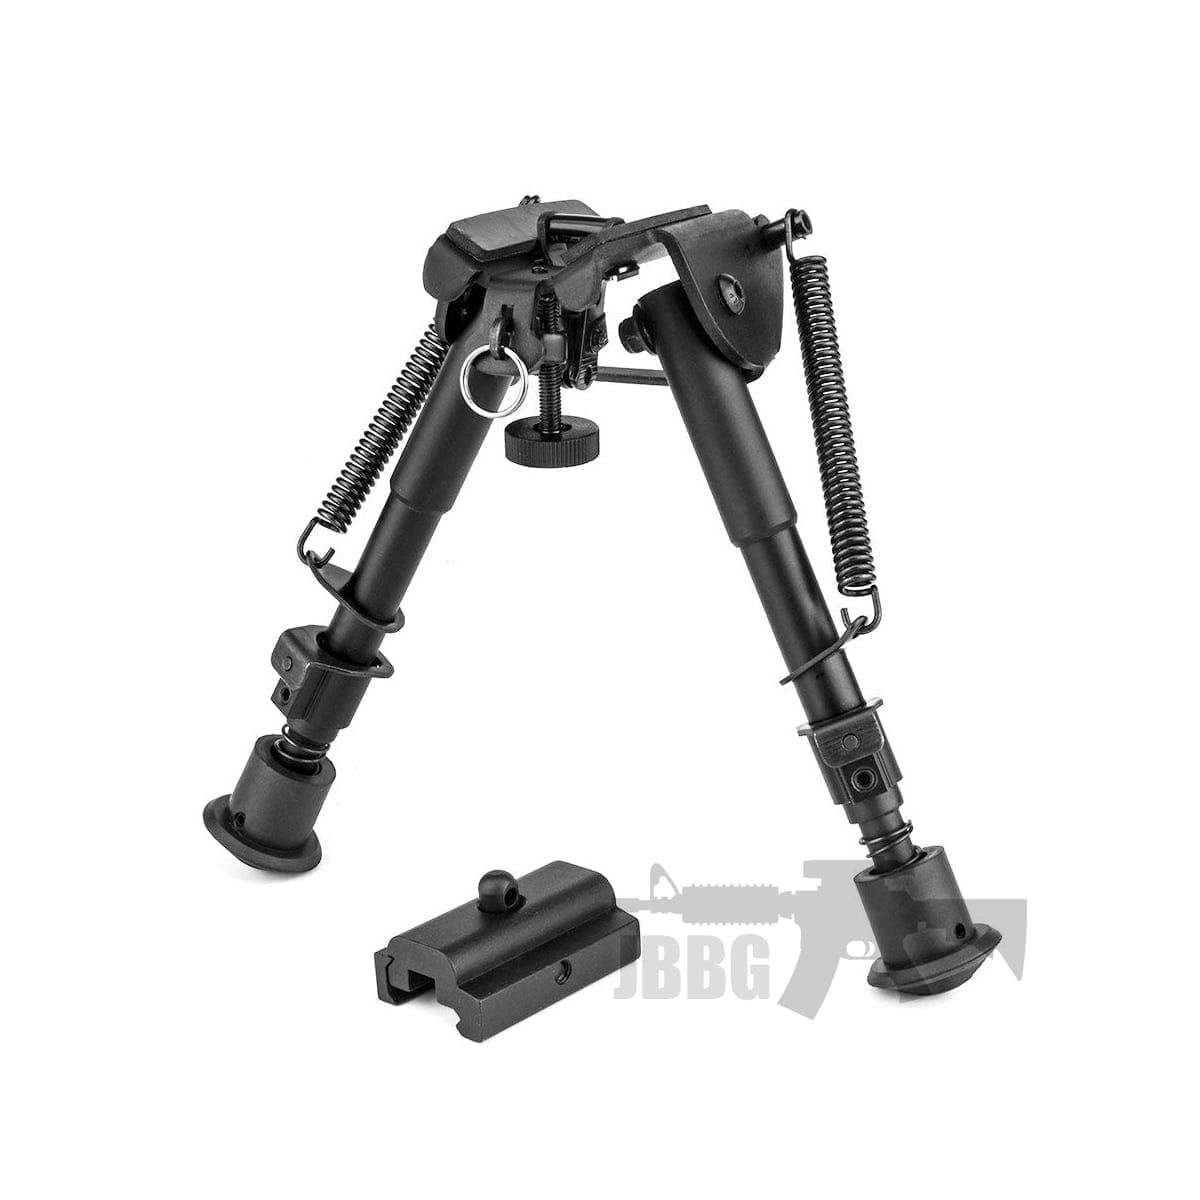 PRO BIPOD sniper mount retractable harris type